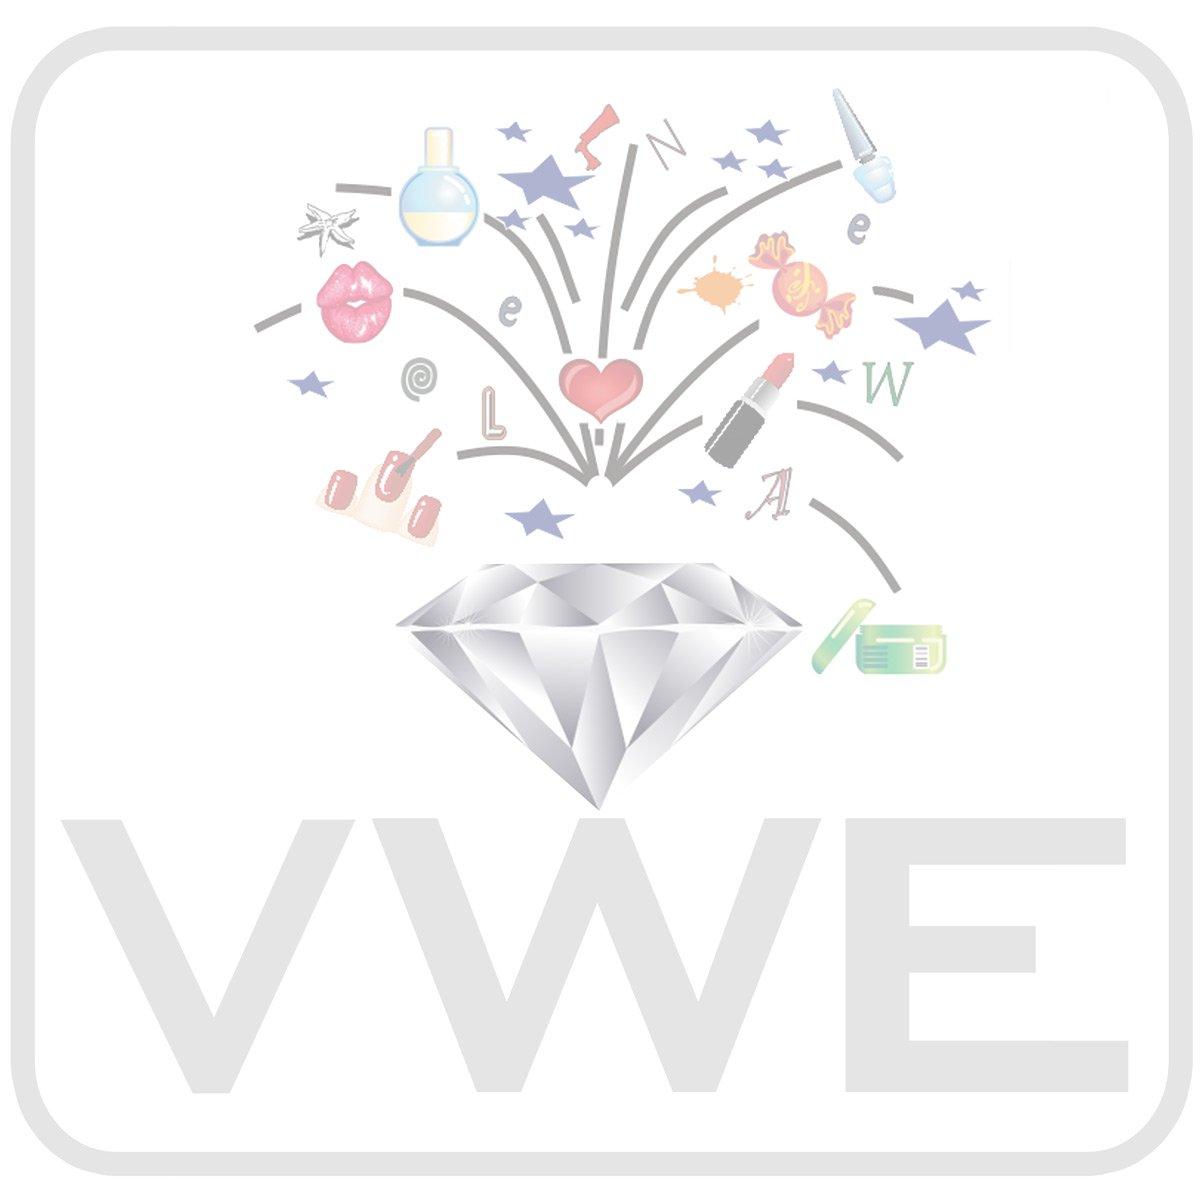 UV Gel Flux Diamond Touch - GFDT15-XS - 5ml  [3 / 3]